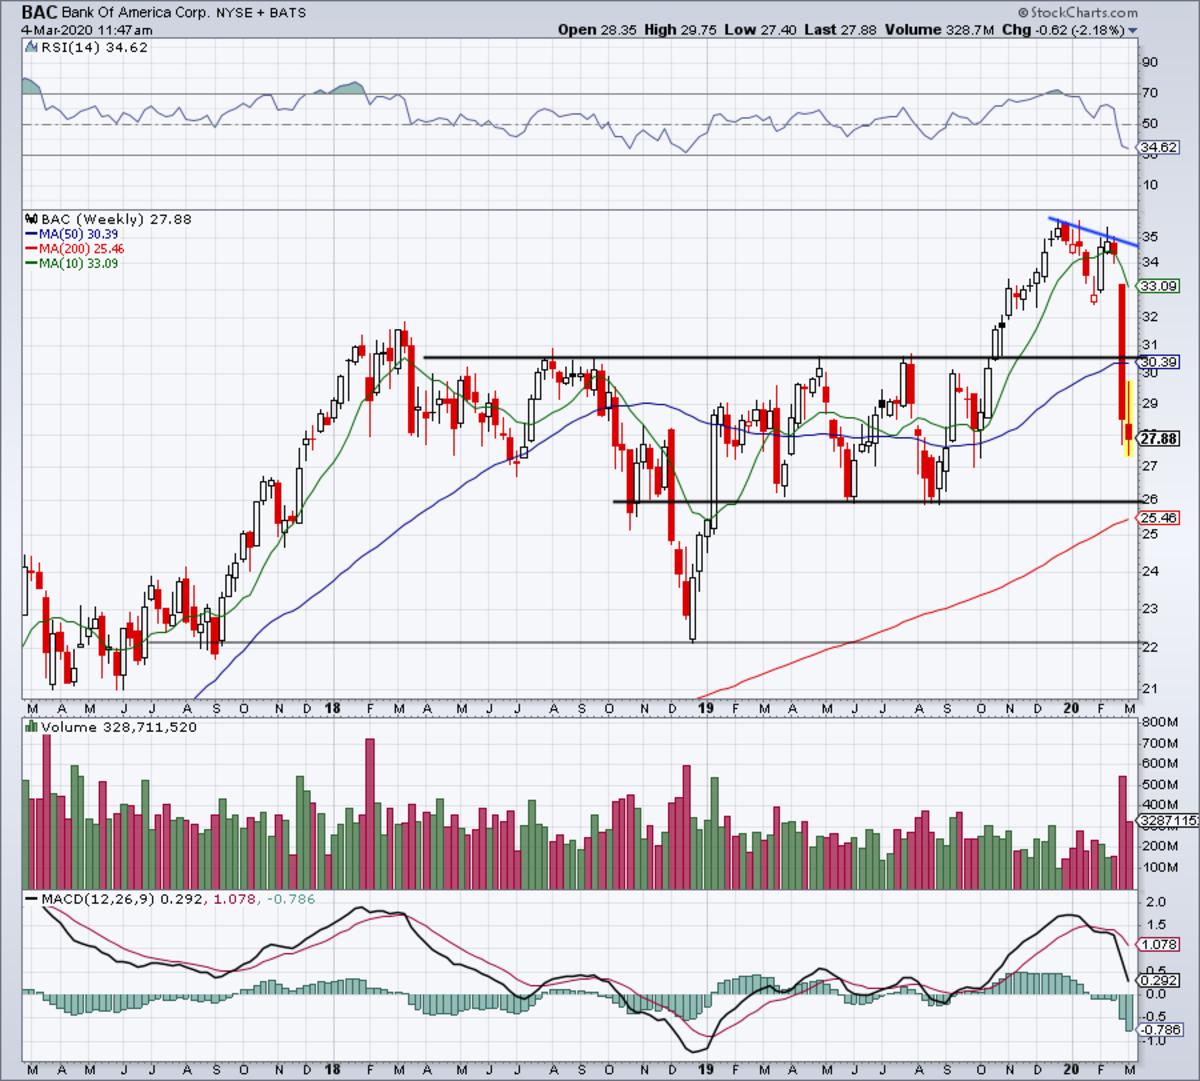 Weekly chart of Bank of America stock.